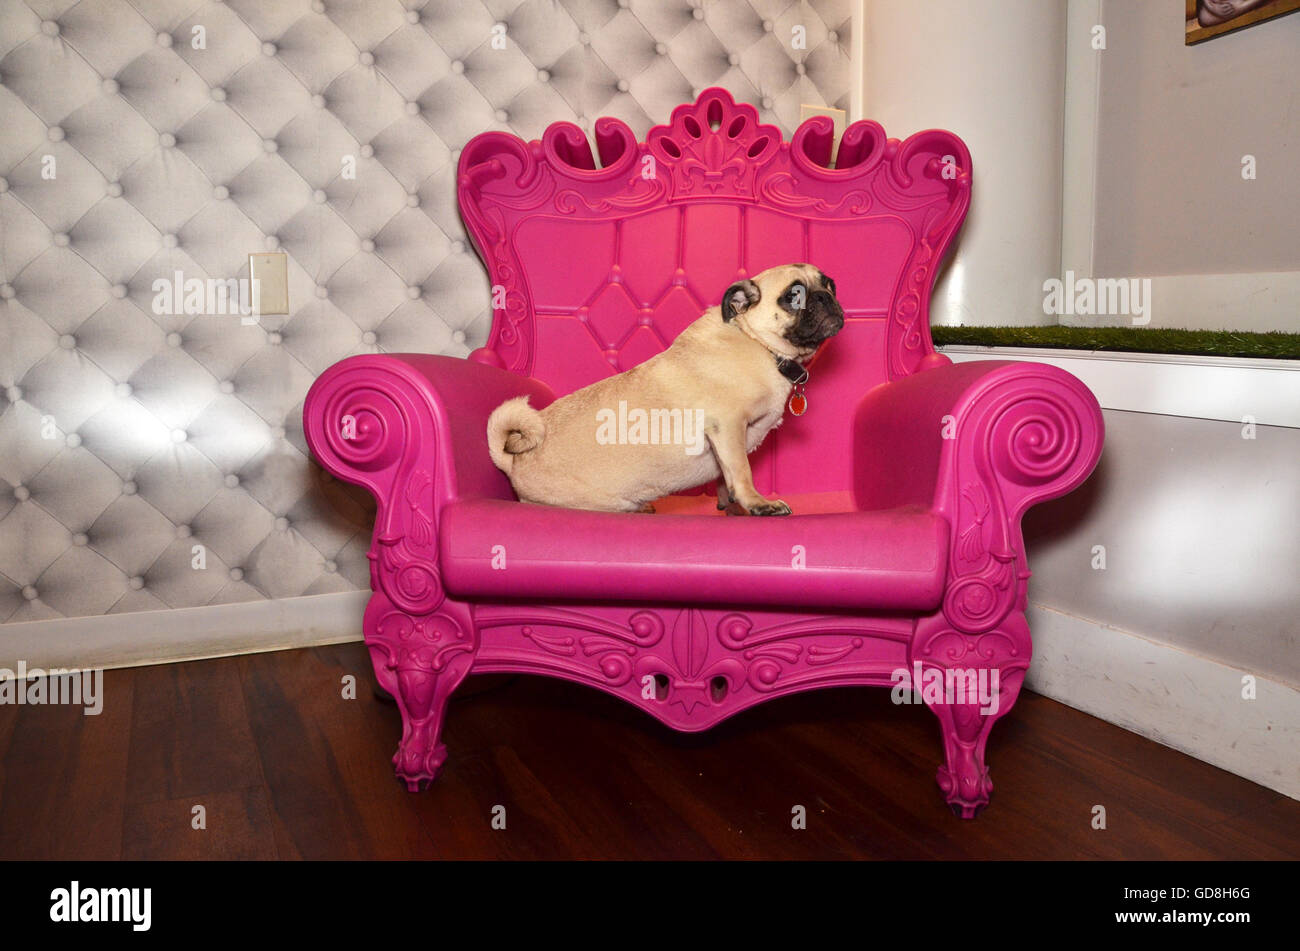 D Pet Hotels Chelsea Manhattan new york USA pug on pink throne Stock Photo